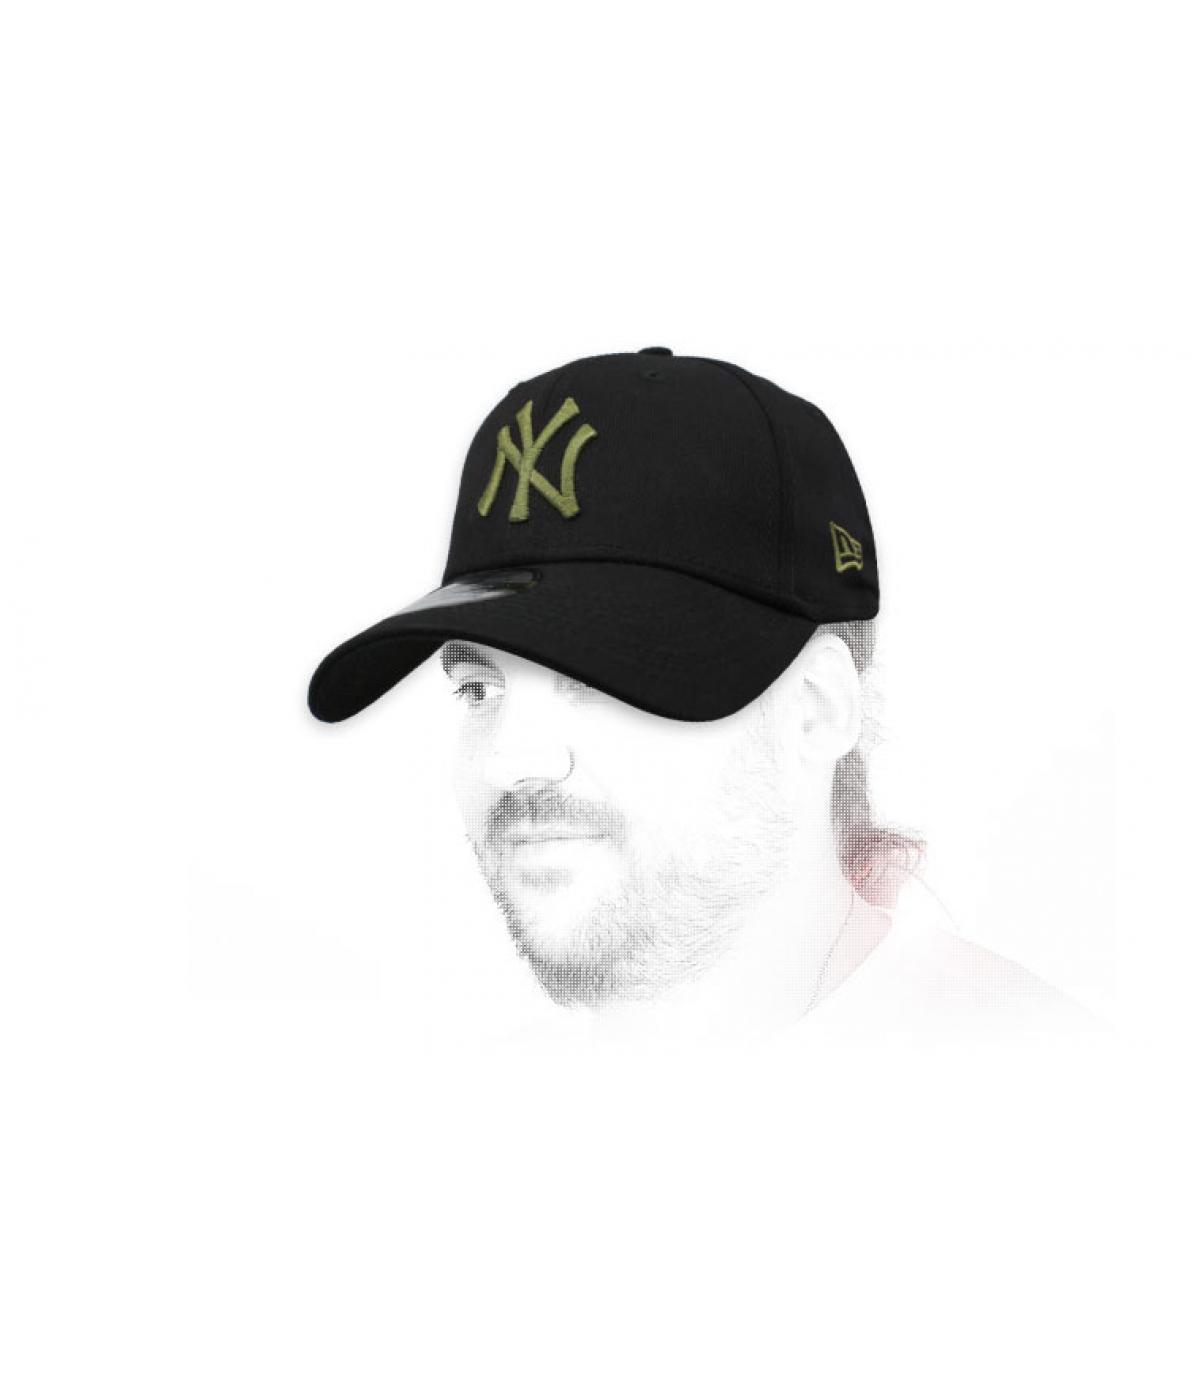 zwarte NY cap groen